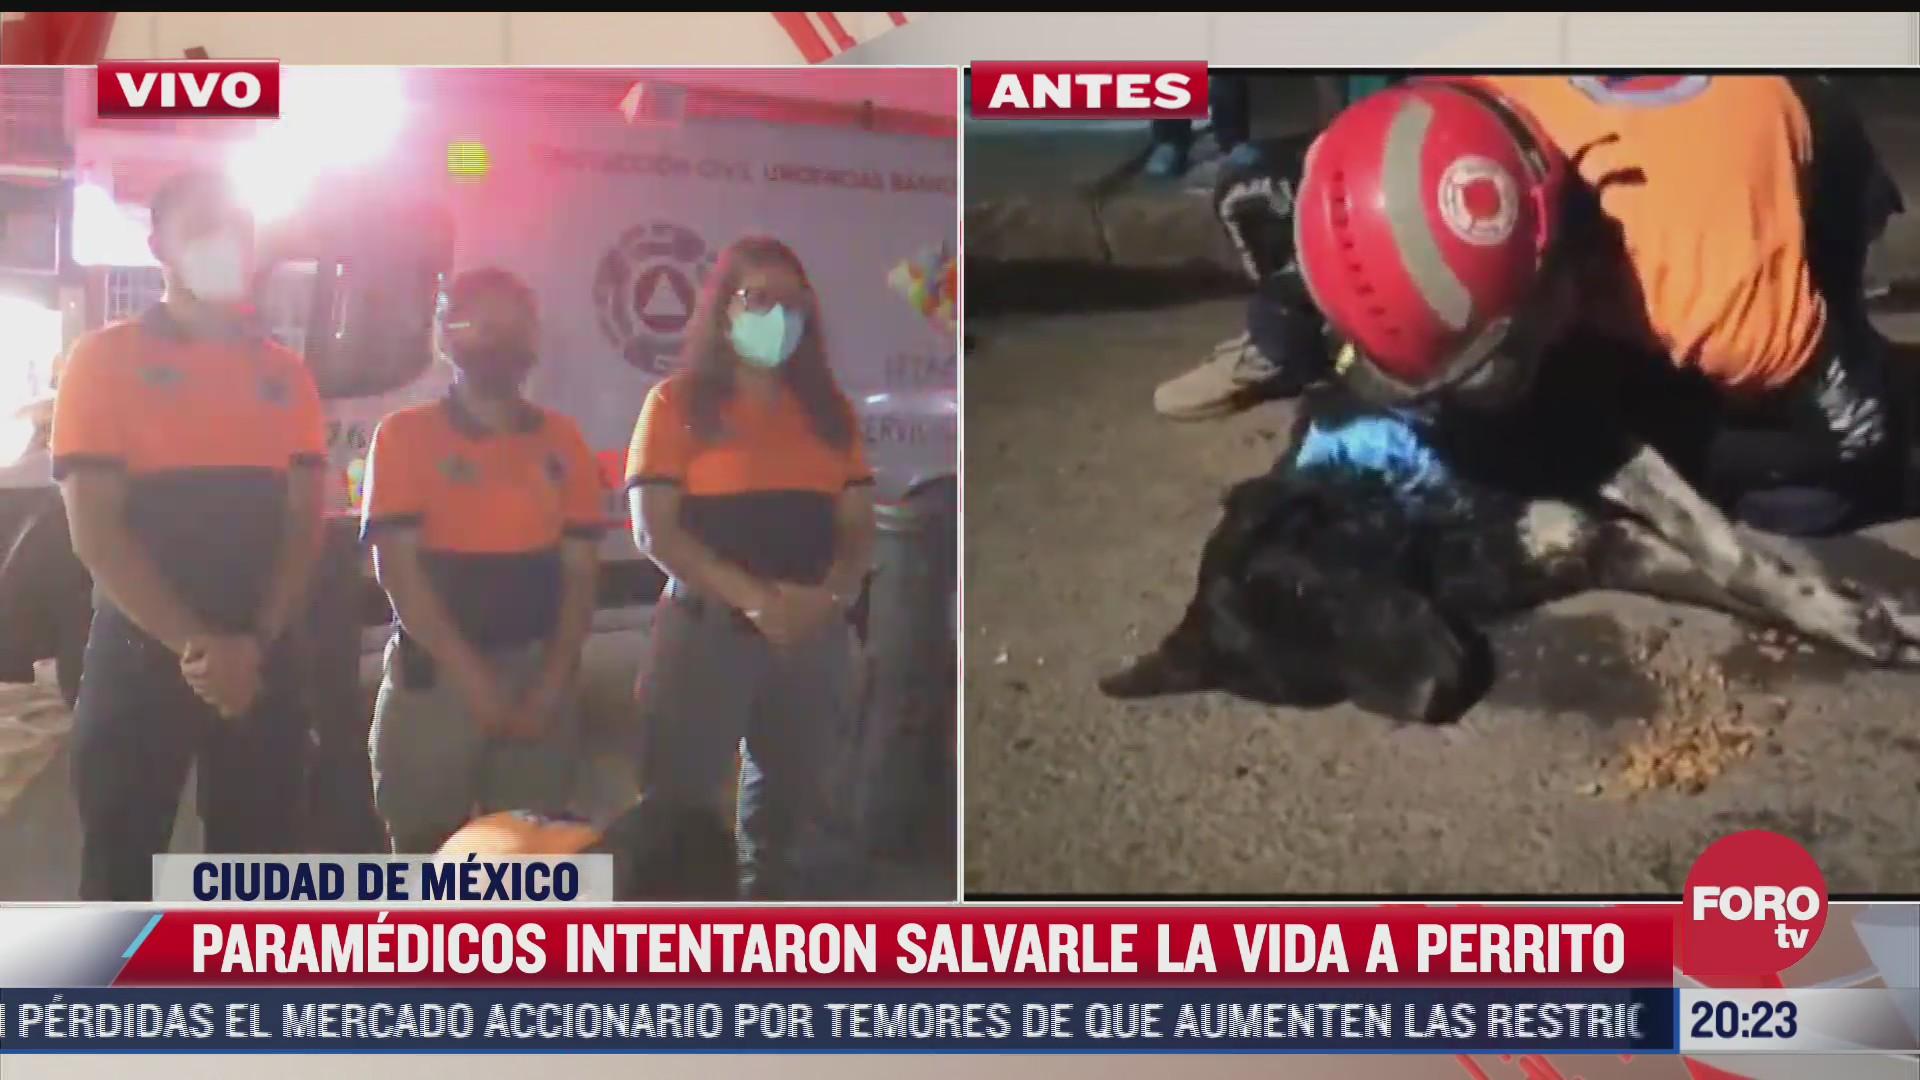 muere perrito que intento ser reanimado por paramedicos en iztapalapa